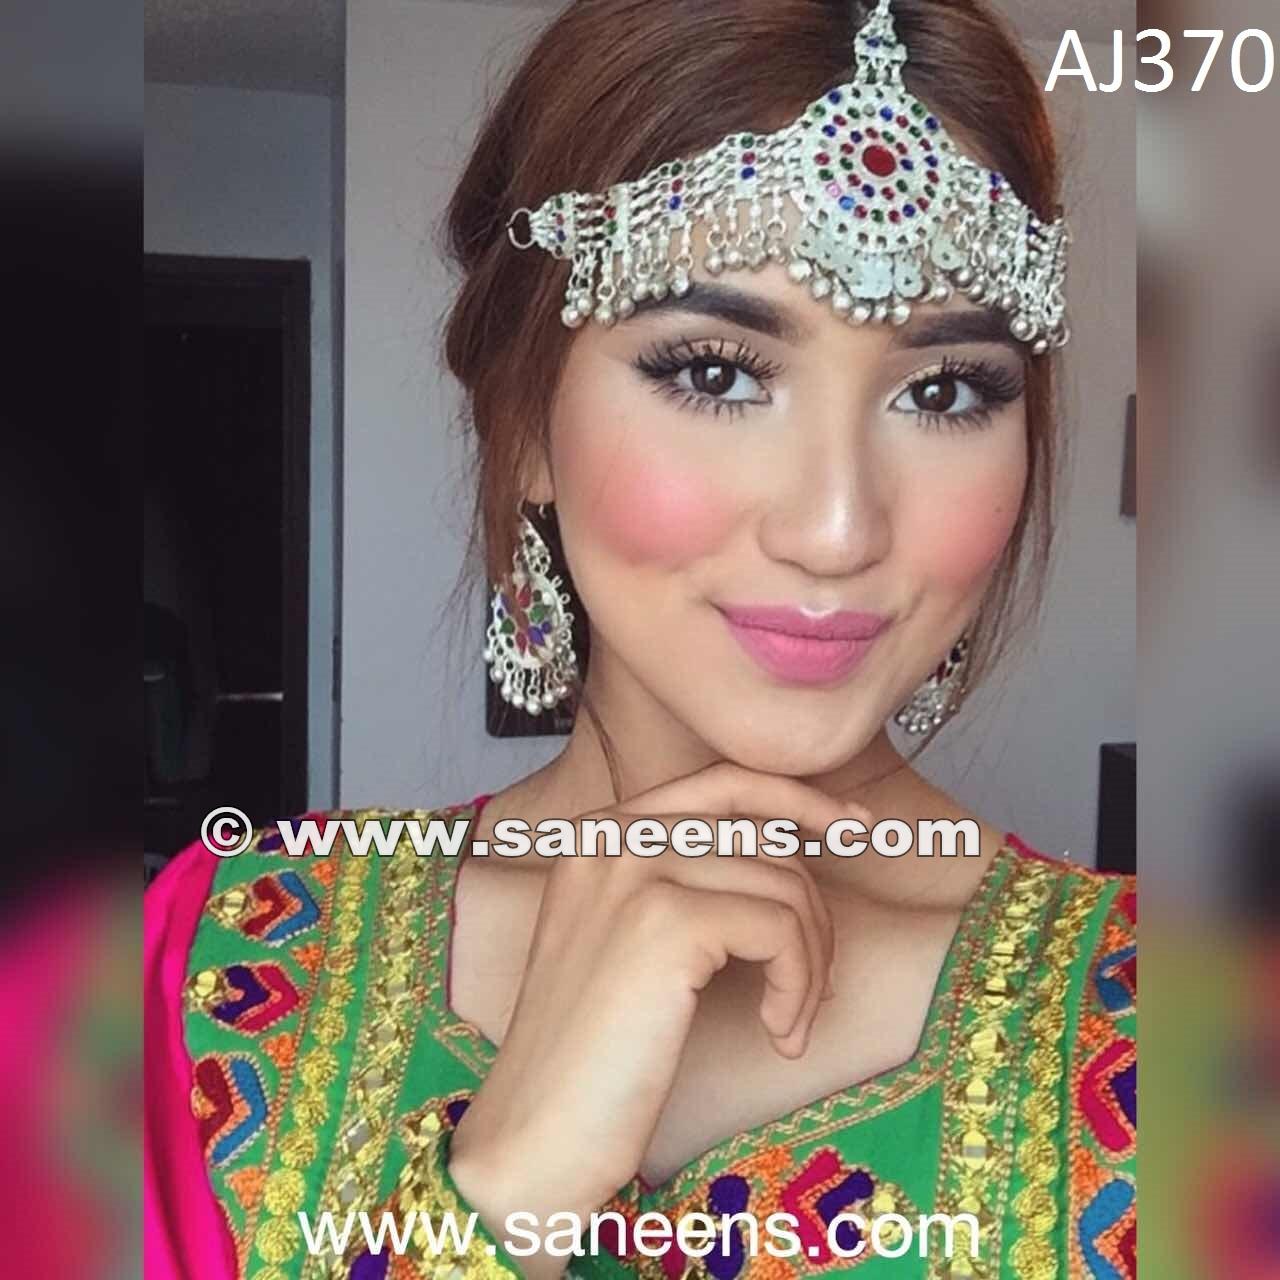 Afghan Brides Jewelry Set Tribal Belly Dance Random Ornaments